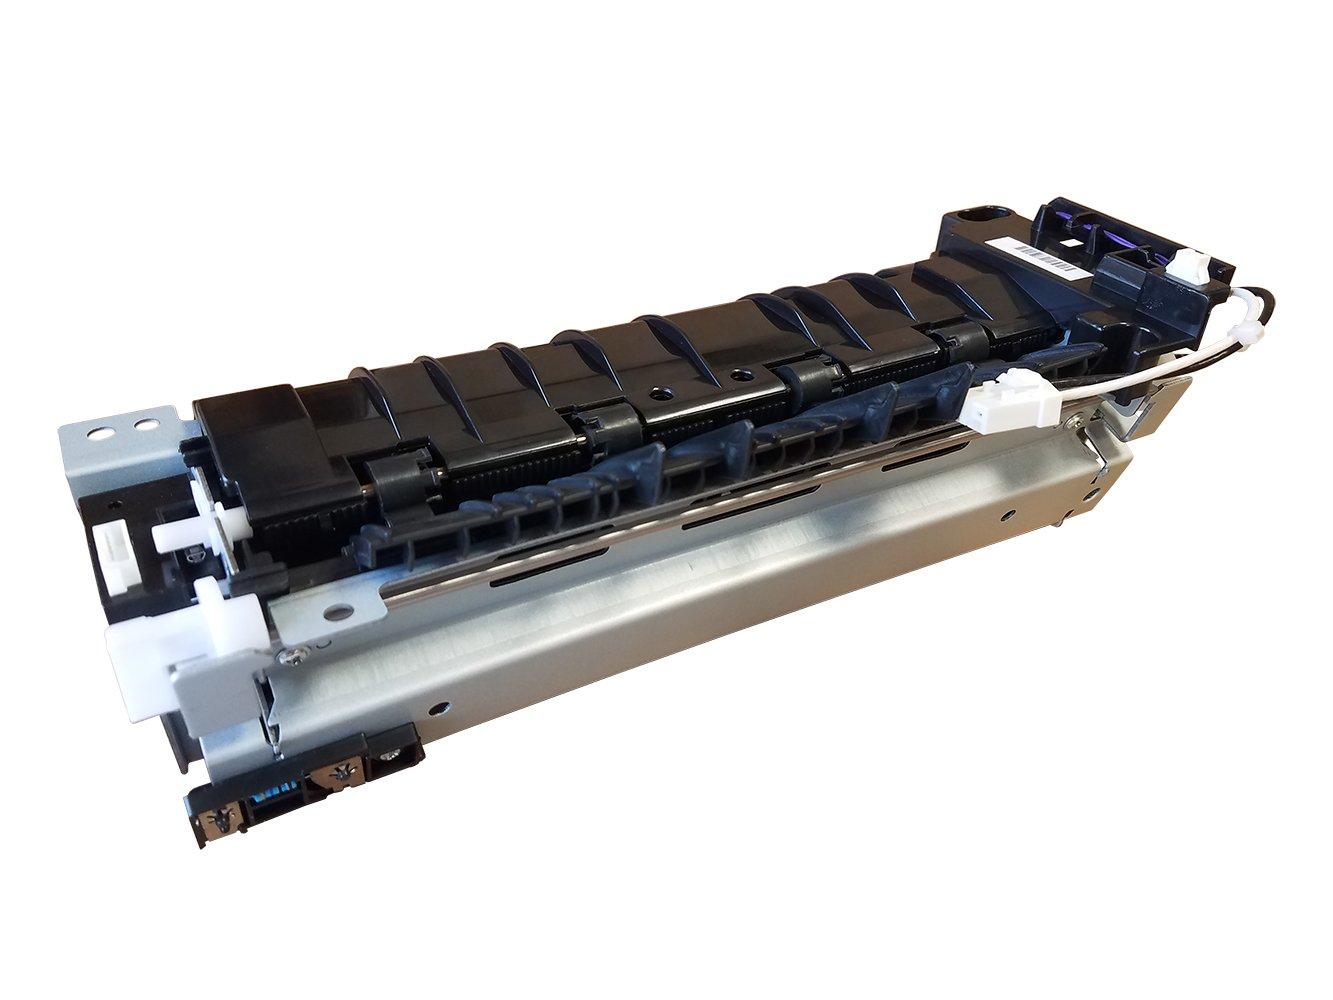 Altru Print CE525-67901-DLX-AP Deluxe Maintenance Kit for HP Laserjet P3015 (110V) Includes RM1-6274 Fuser, Transfer Roller & Tray 1/2 / 3 Rollers by Altru Print (Image #2)